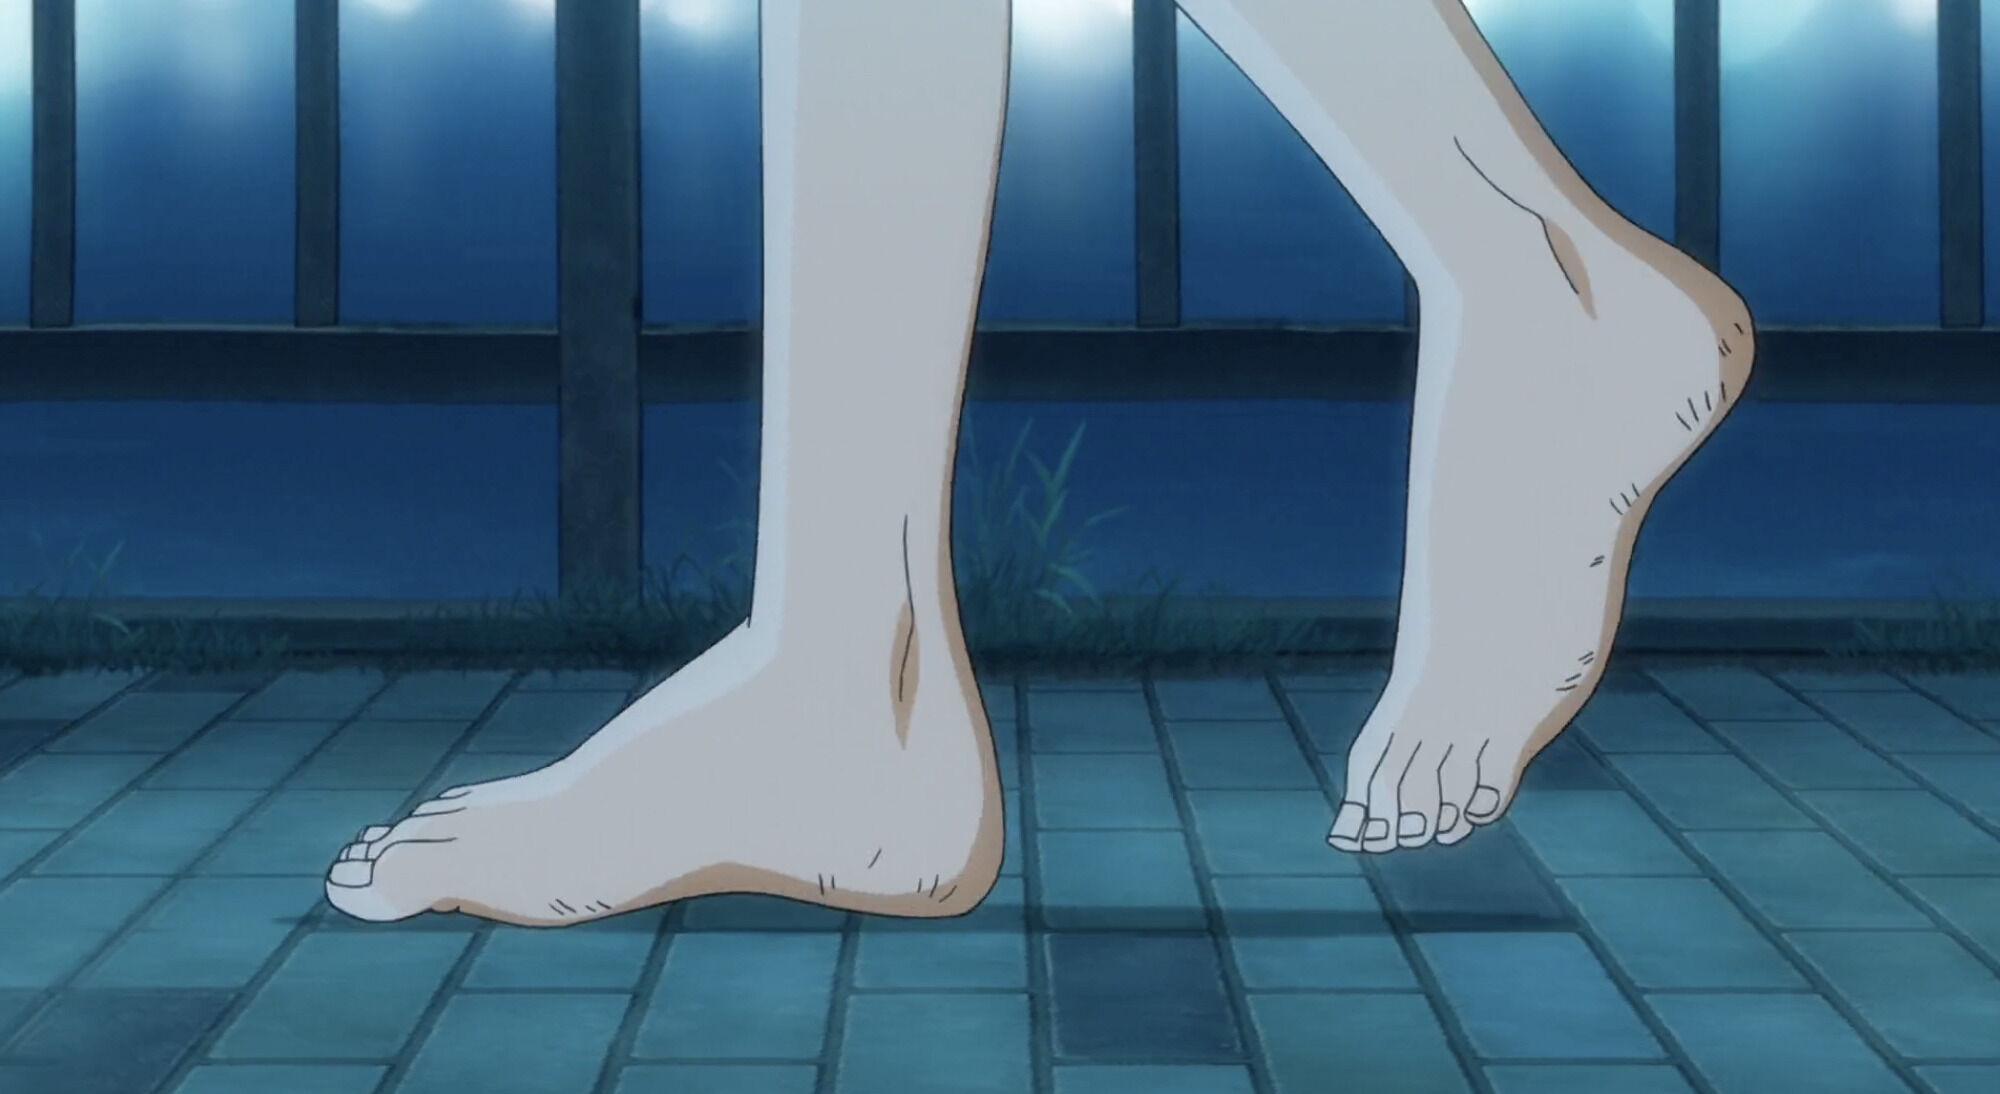 Episode 14 footsteps shigatsu wa kimi no uso wiki fandom powered by wikia